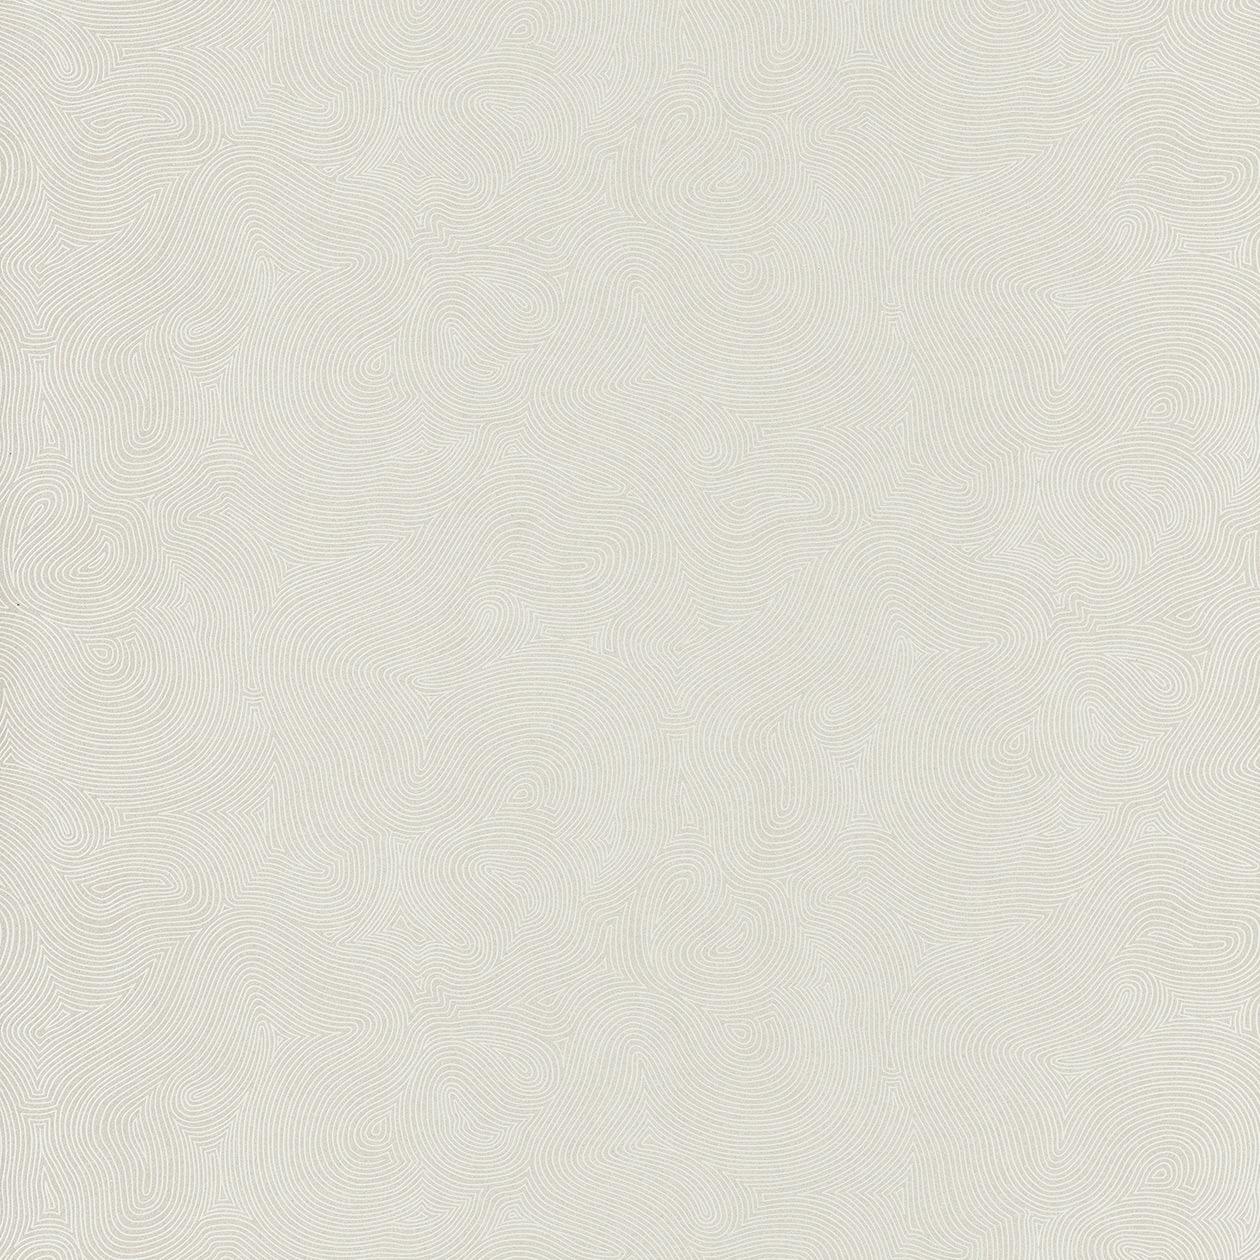 Французские обои Caselio,  коллекция Trio, артикулTIO68020000